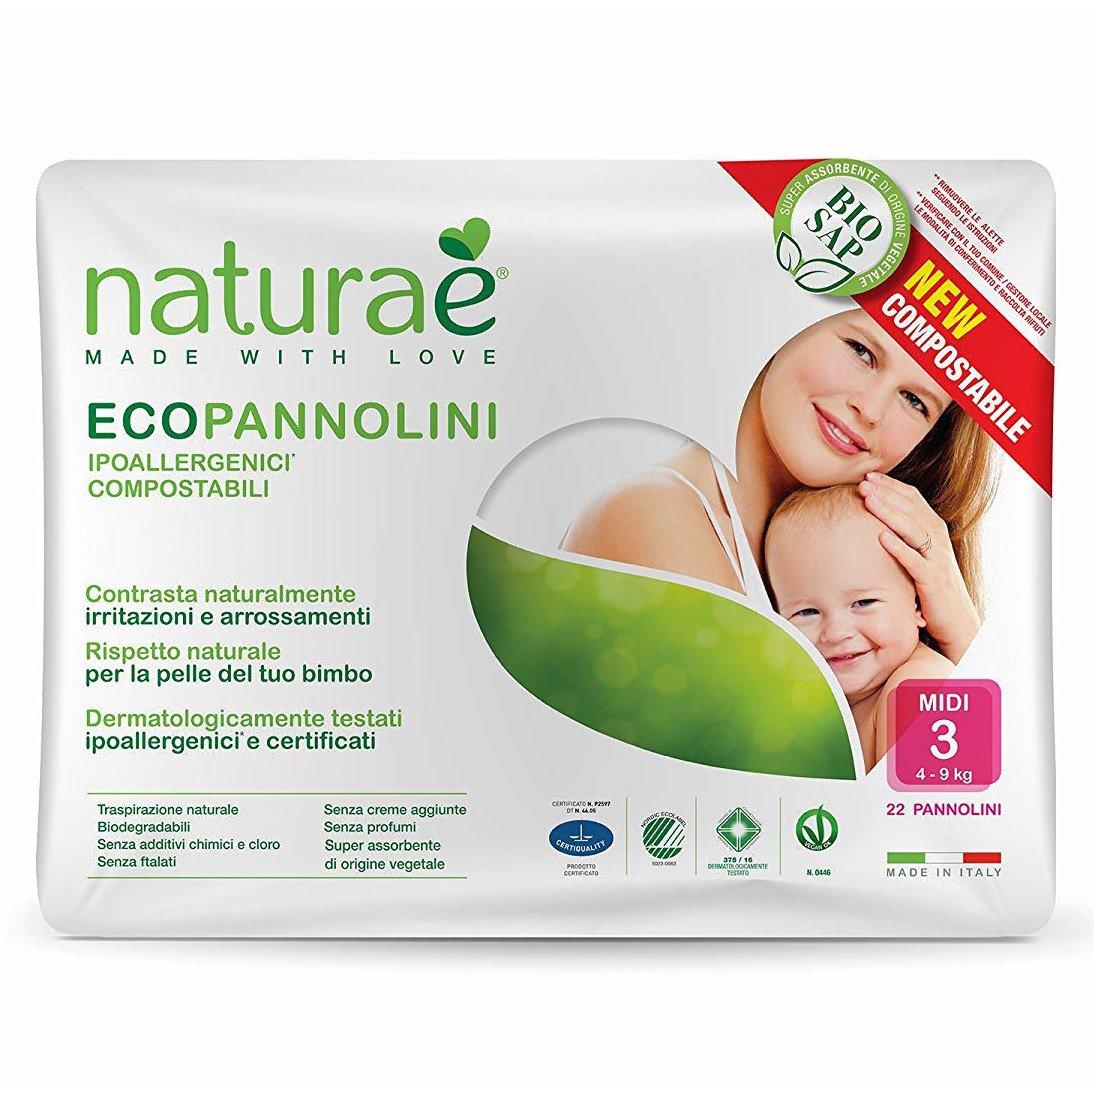 Ecopannolini Compostabili Naturaè® 3 MIDI 4-9 kg, 22 pz